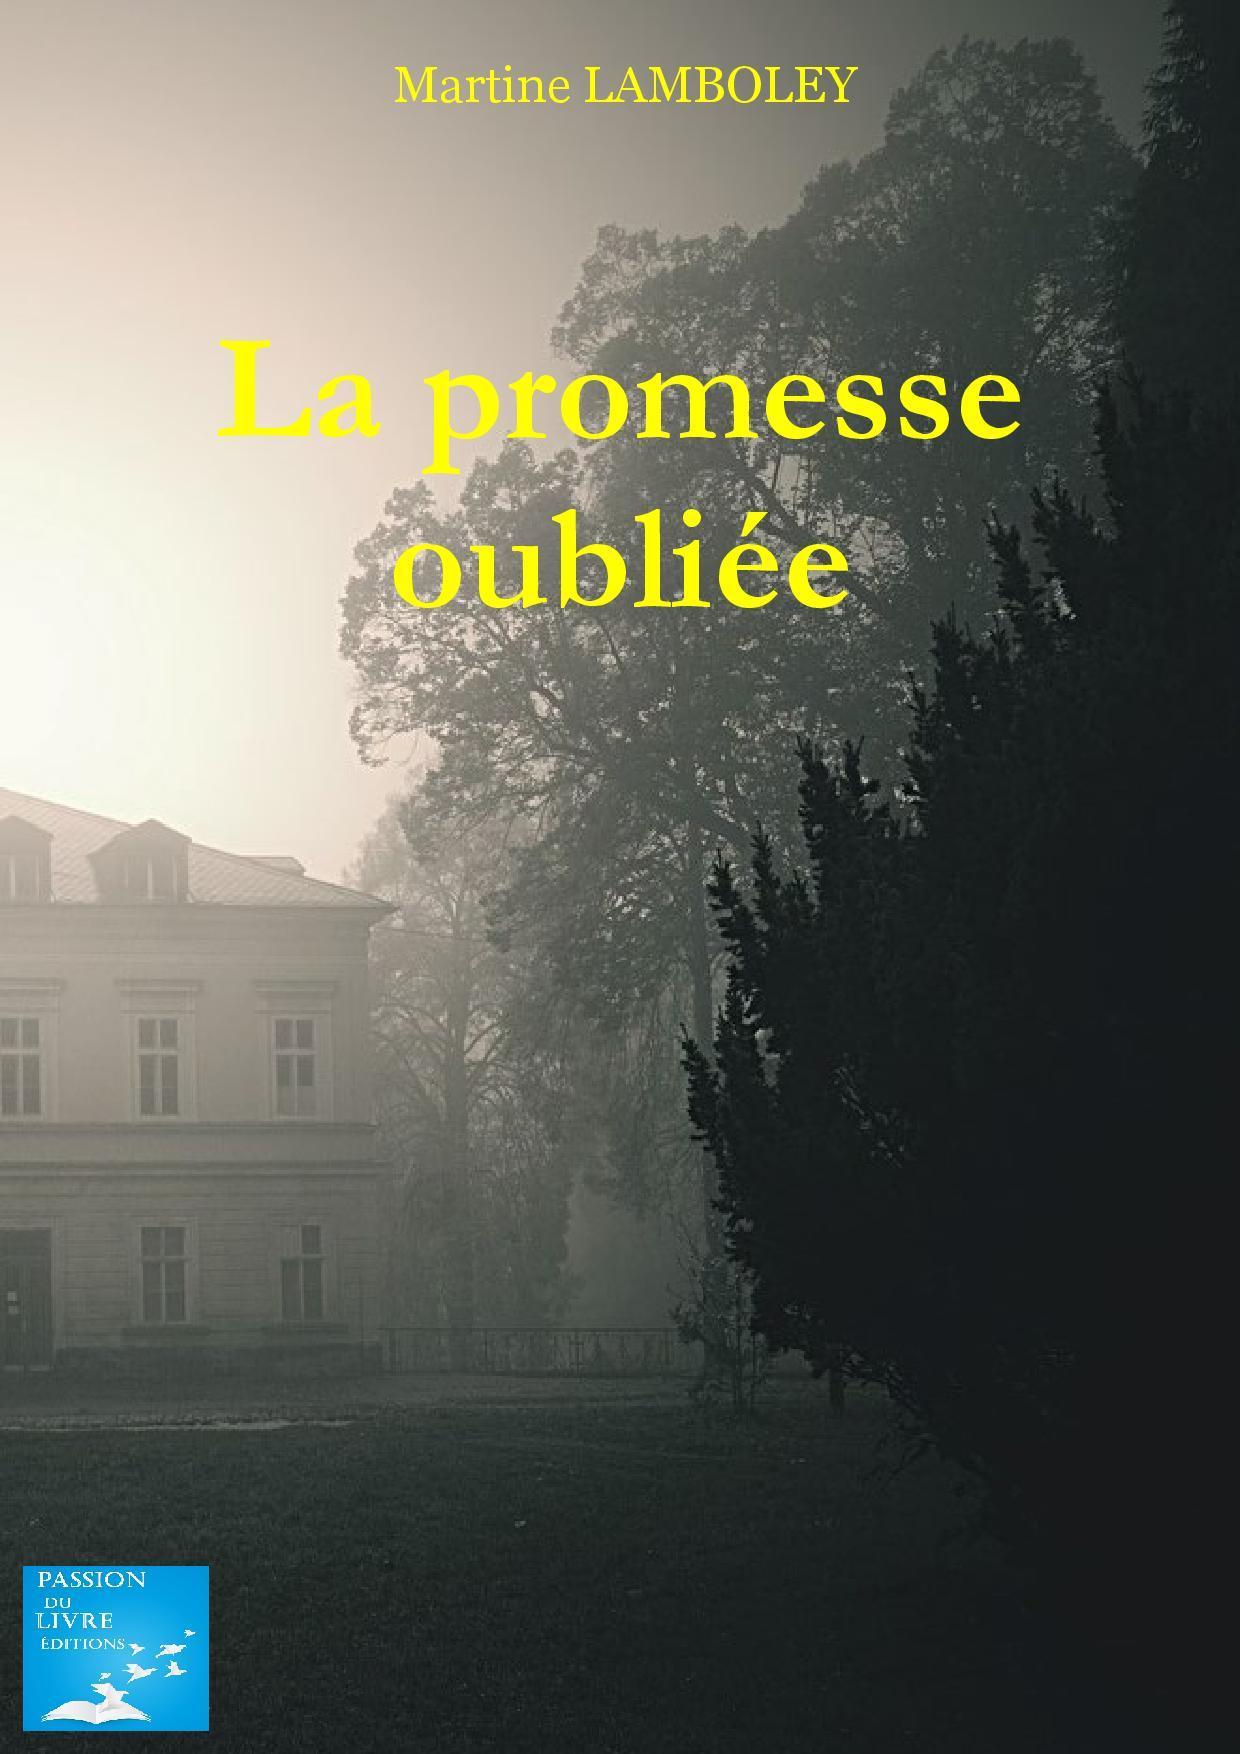 LA PROMESSE OUBLIEE